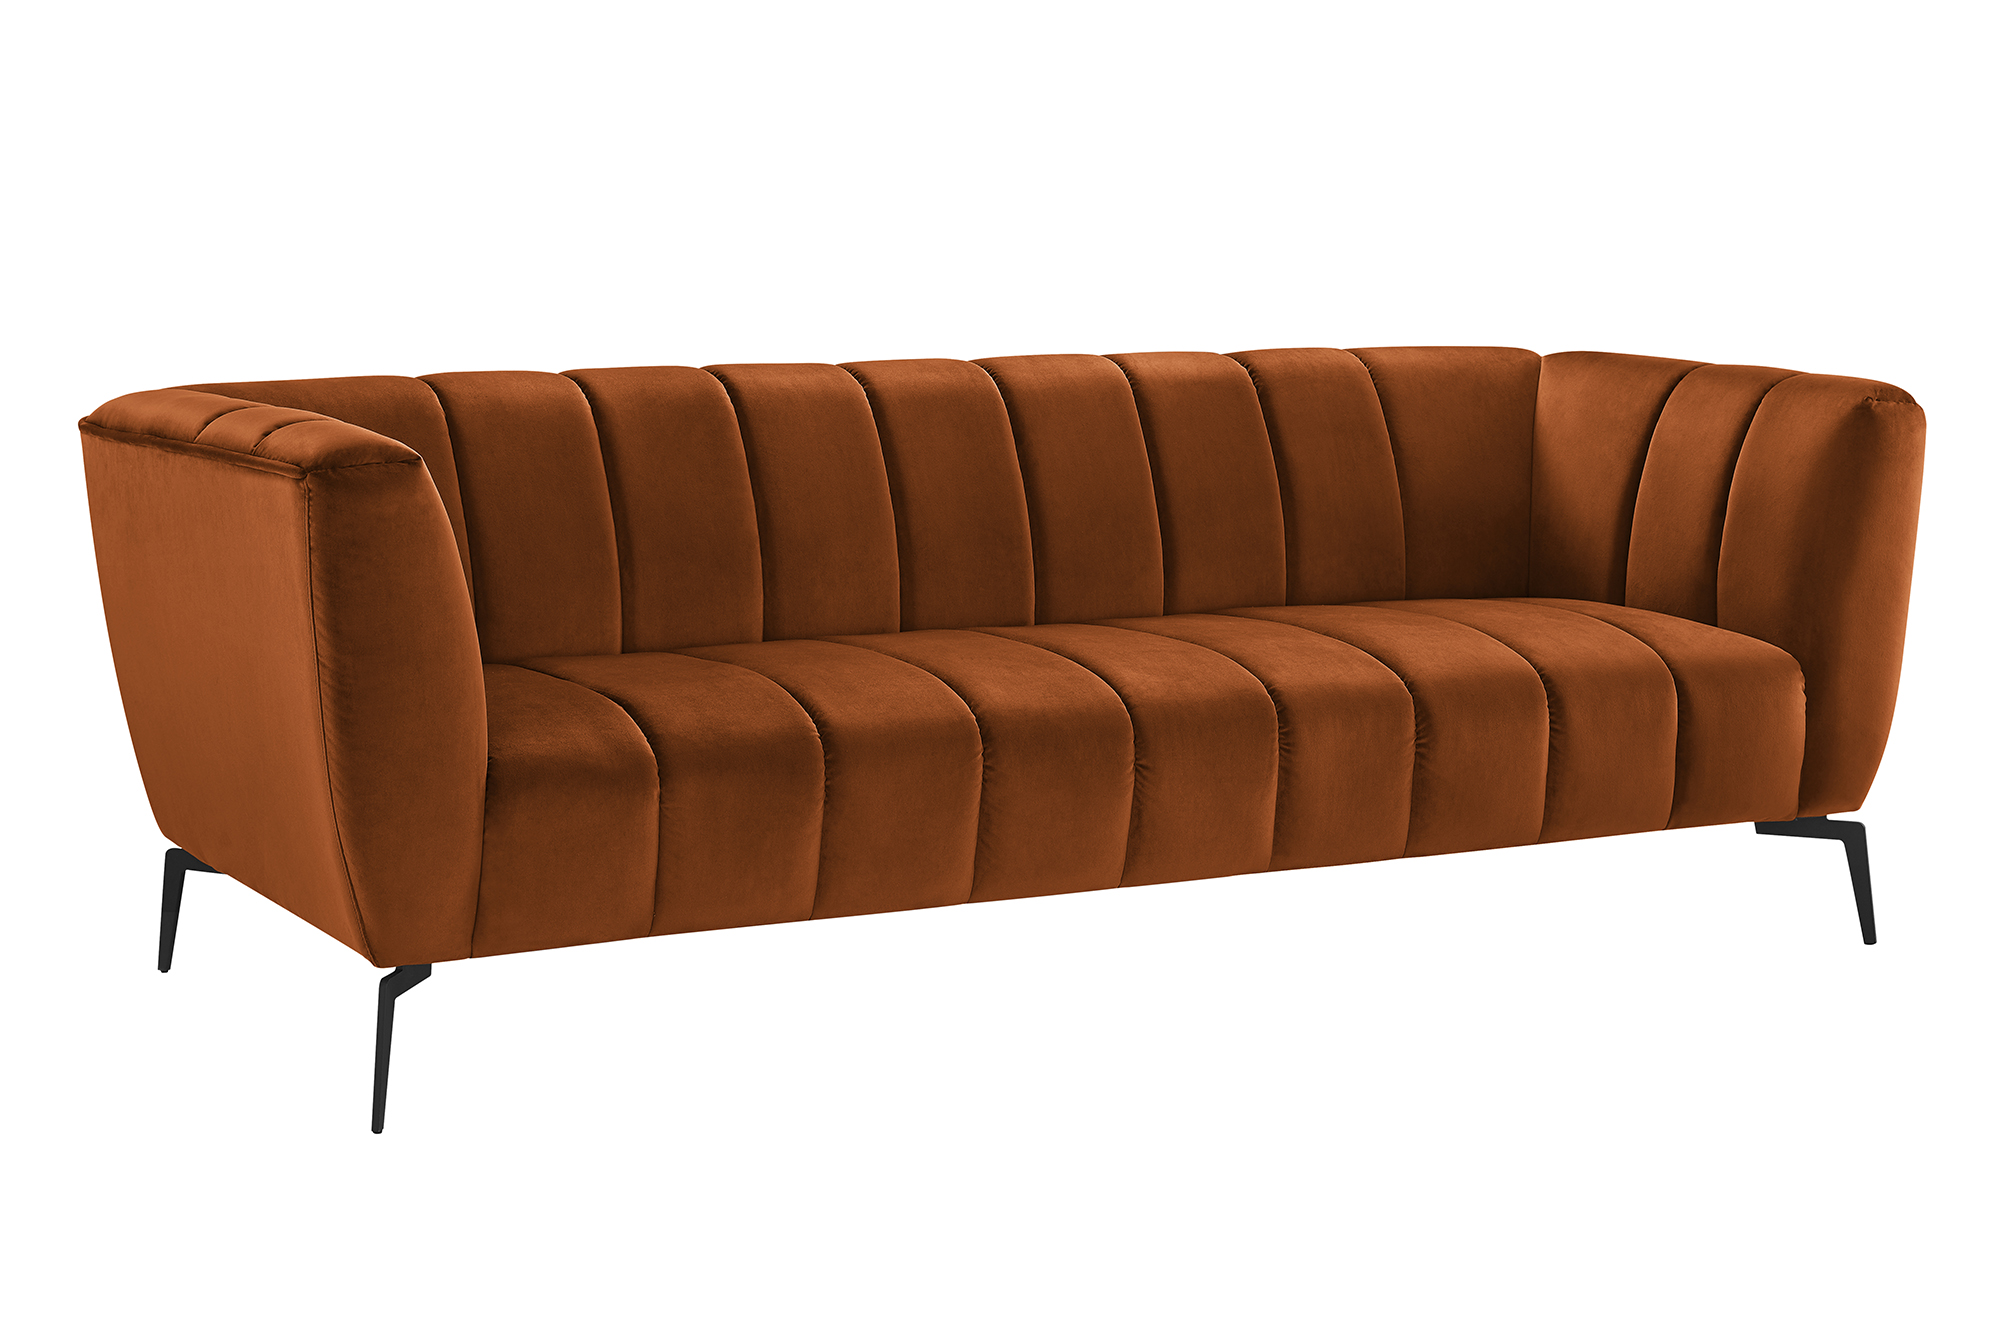 Pavia 3 Personers Sofa I Bronzefarvet Stof Med Sorte Metalben